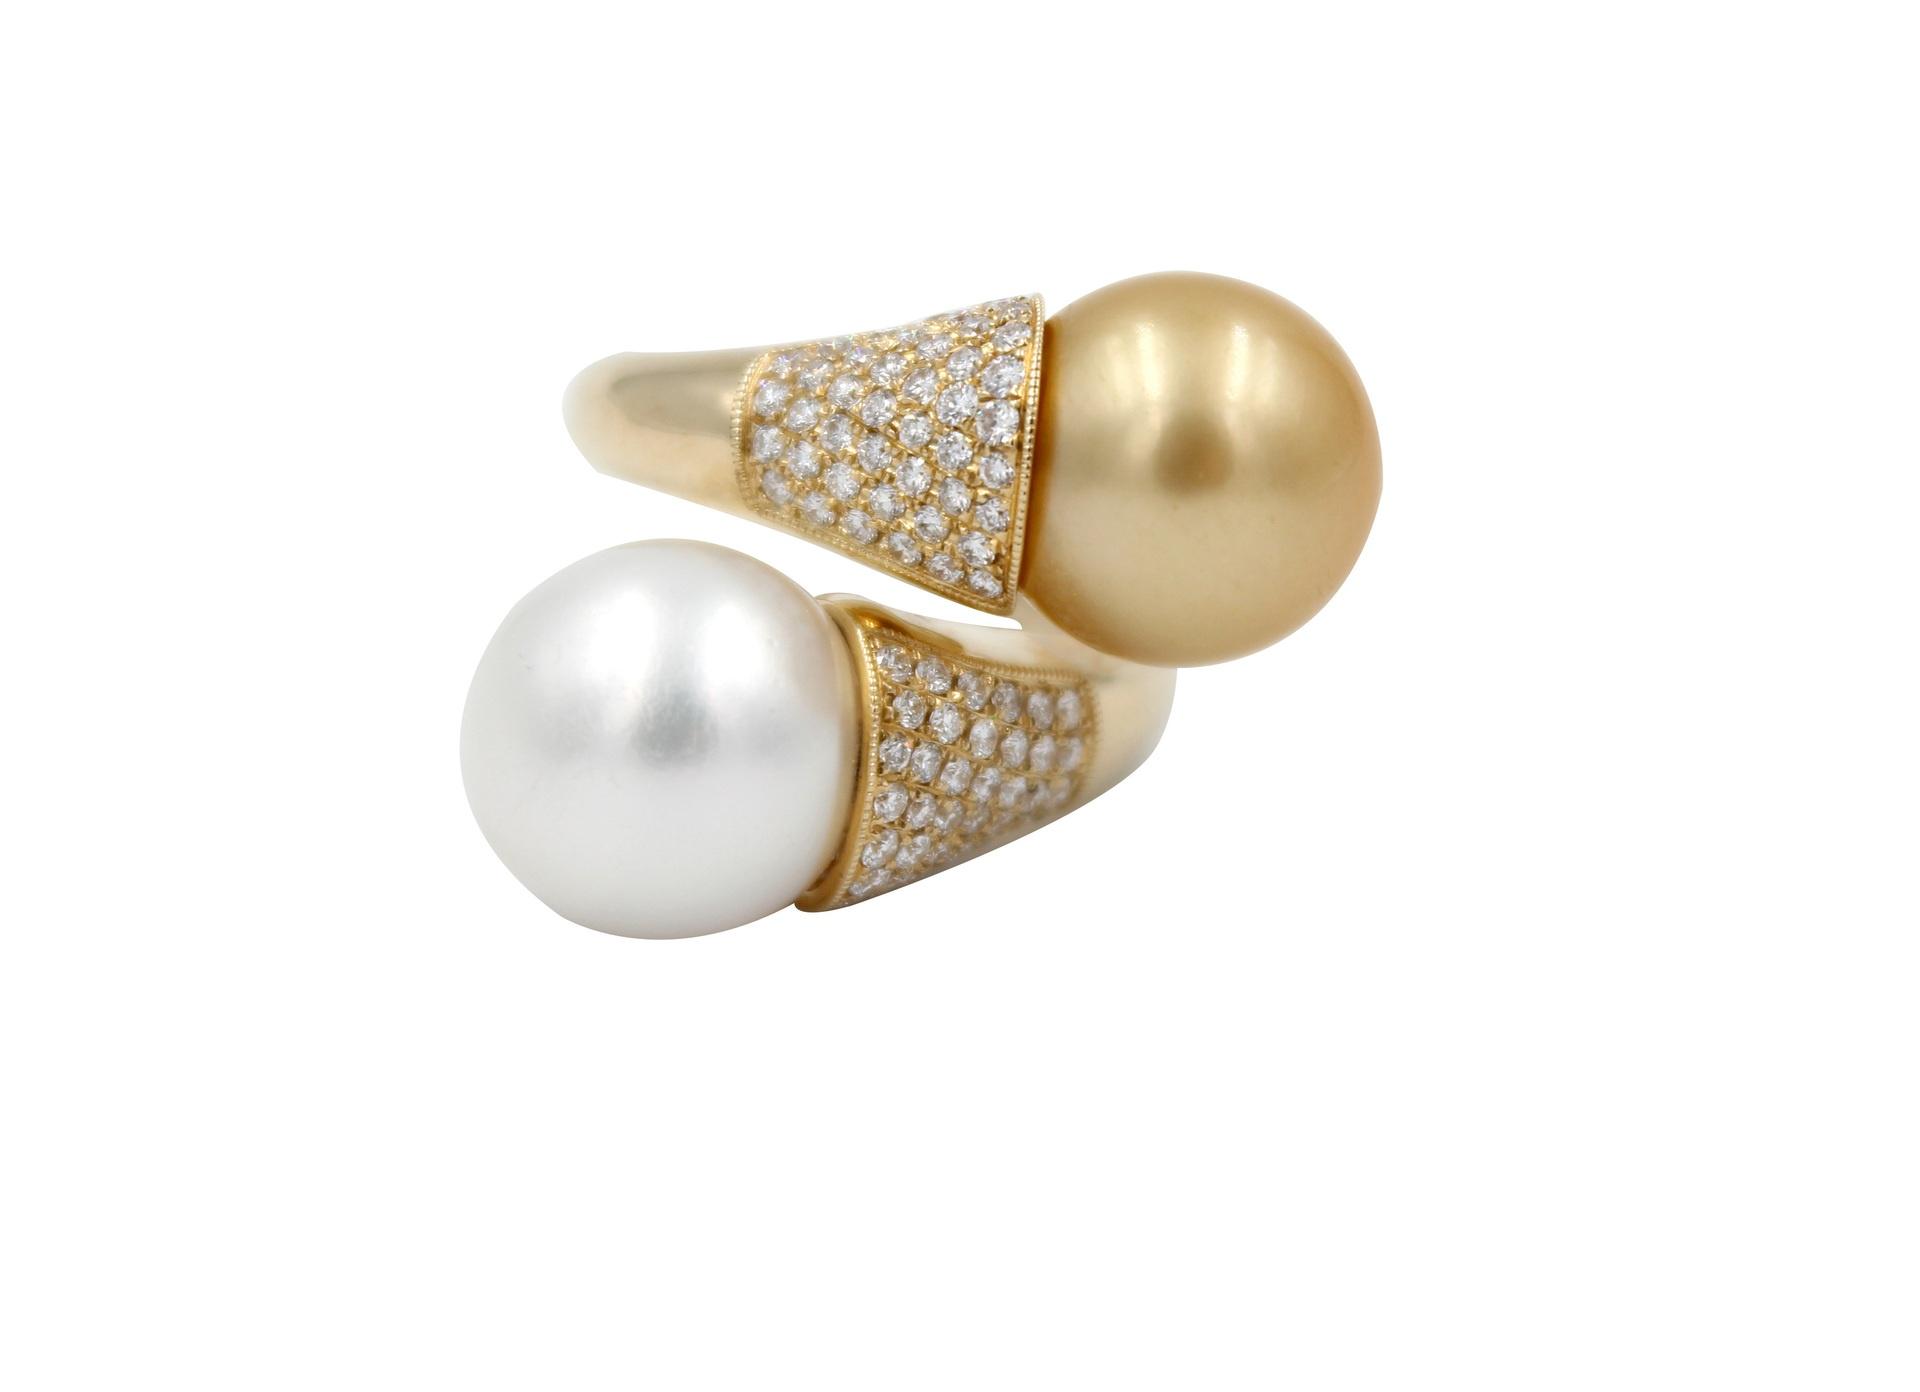 Golden Silver South Sea Pearls & Diamond Ring